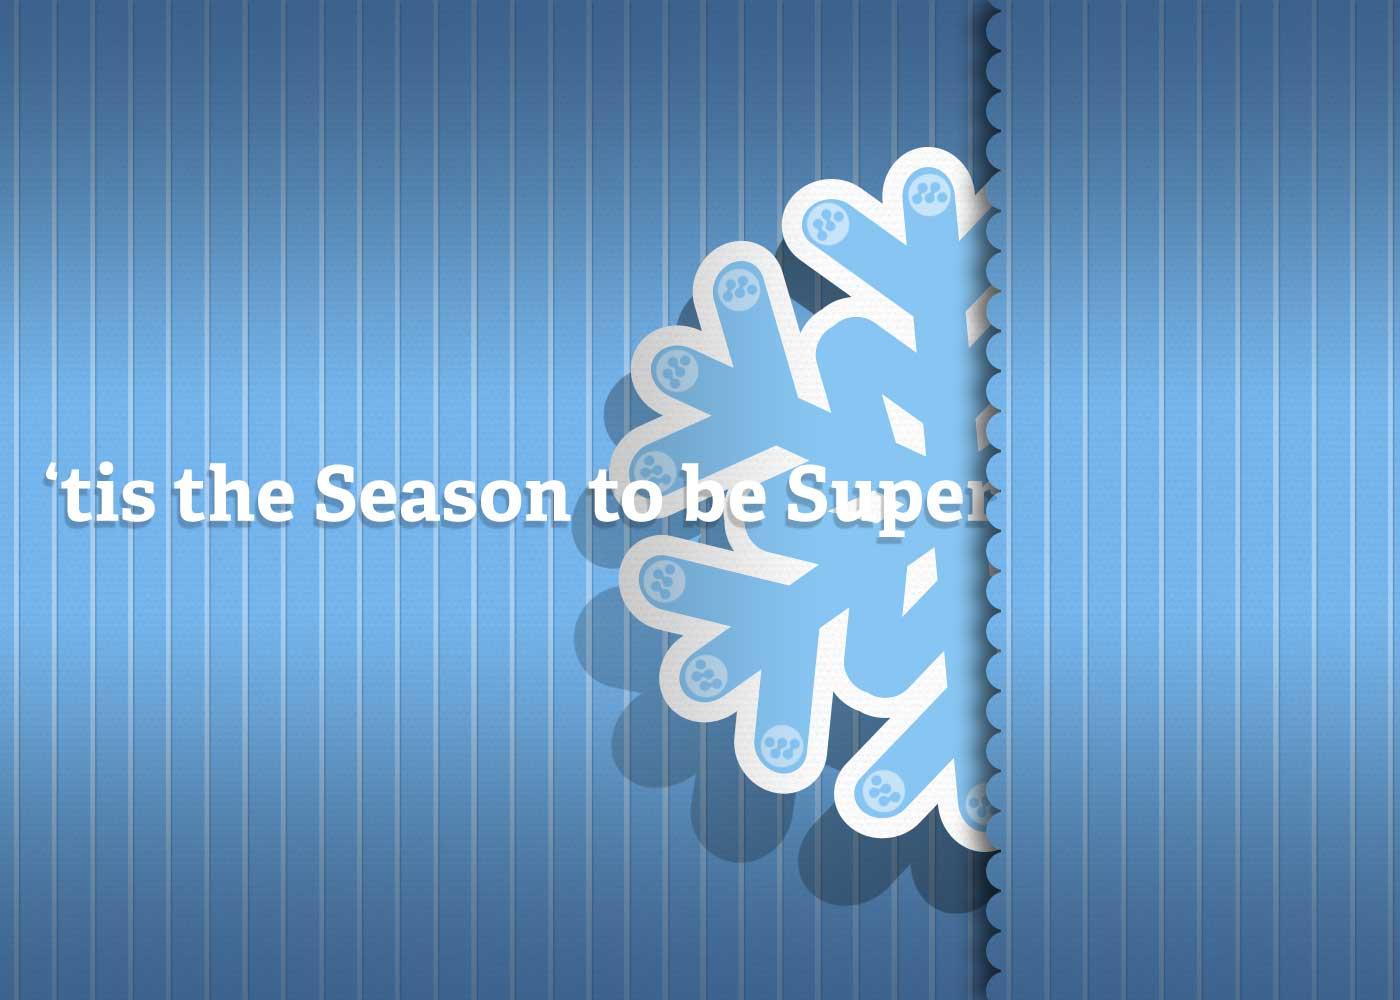 melt-holiday-card-2012.jpg